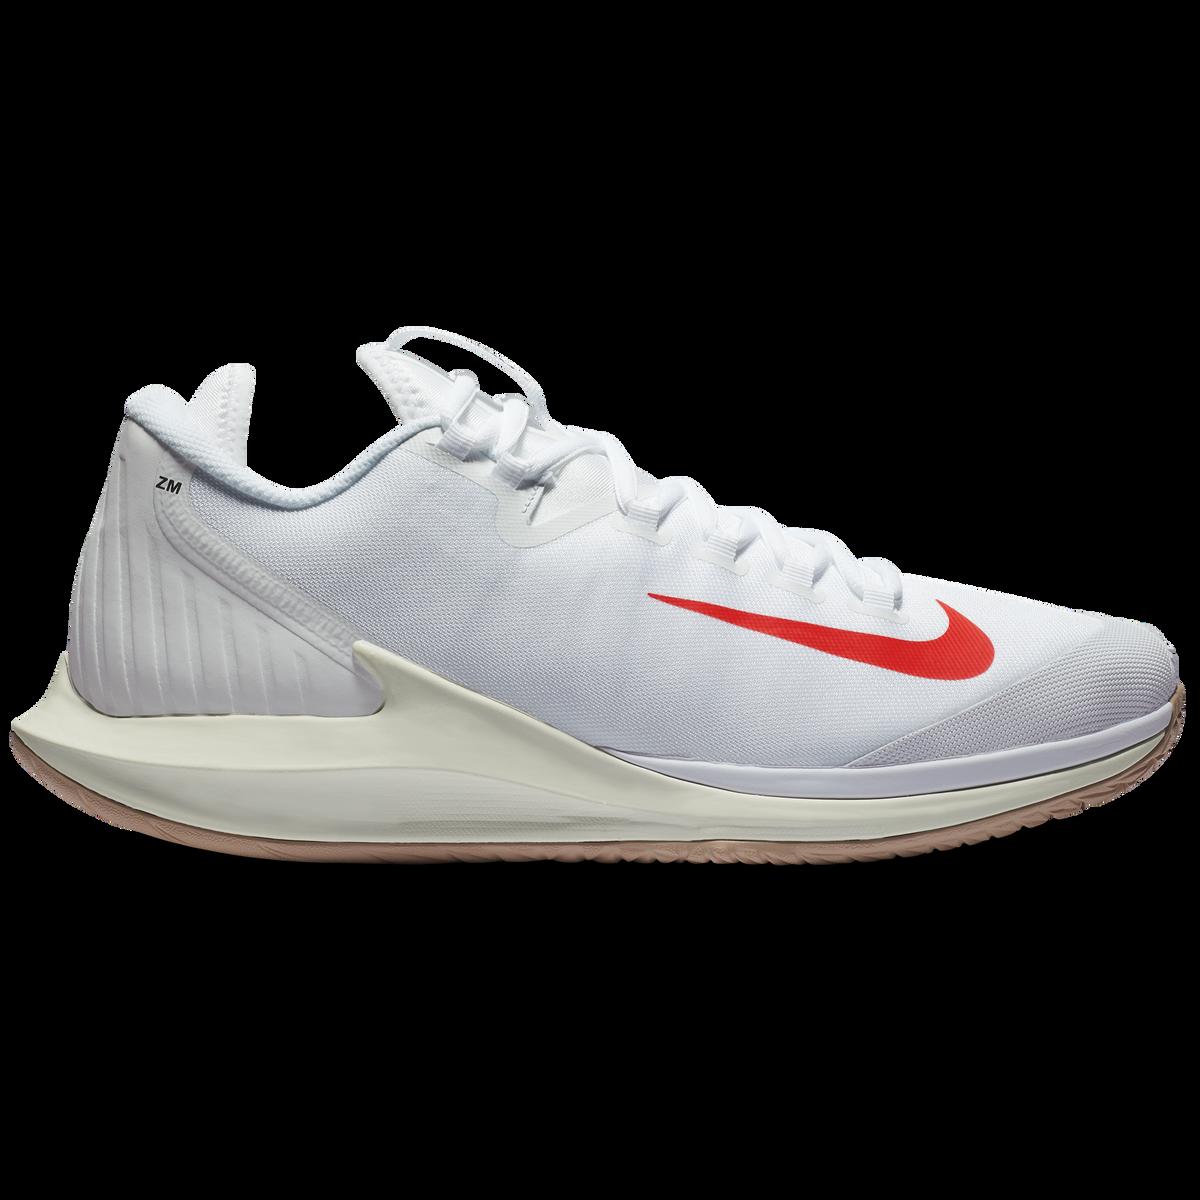 9c5a148738fc5 NikeCourt Air Zoom Zero Men s Tennis Shoe - White Red